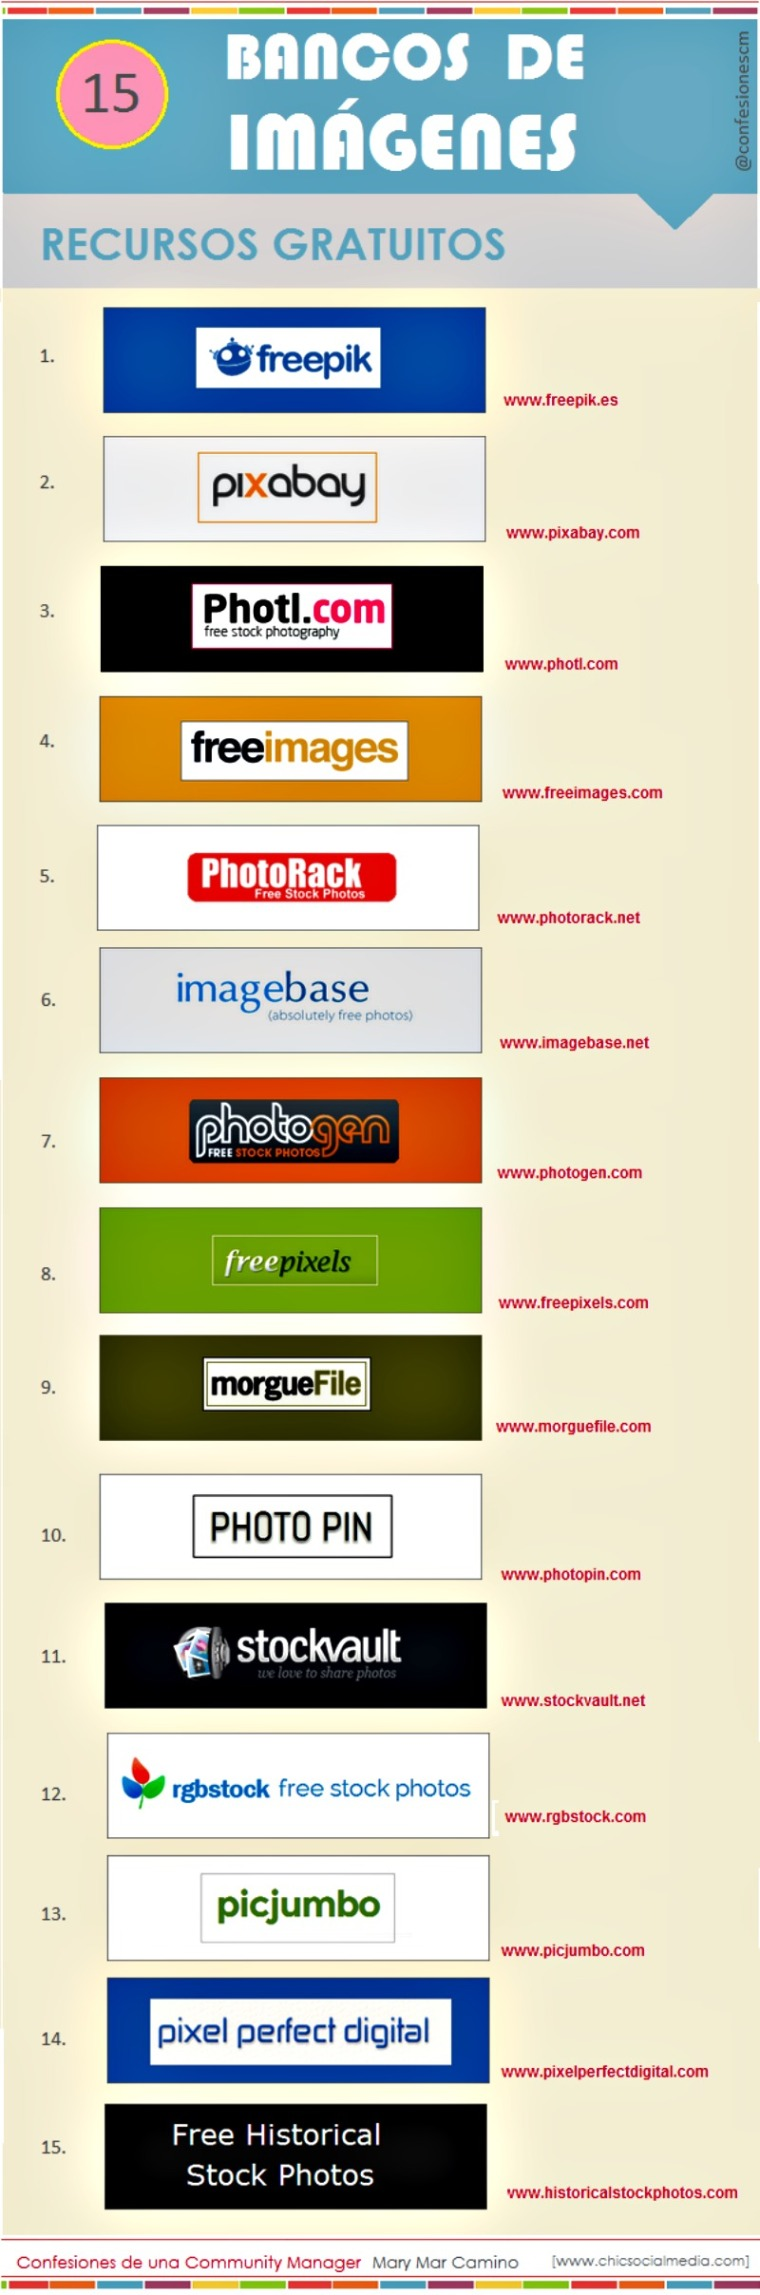 15-bancos-de-imagenes-libres-infografia.jpg